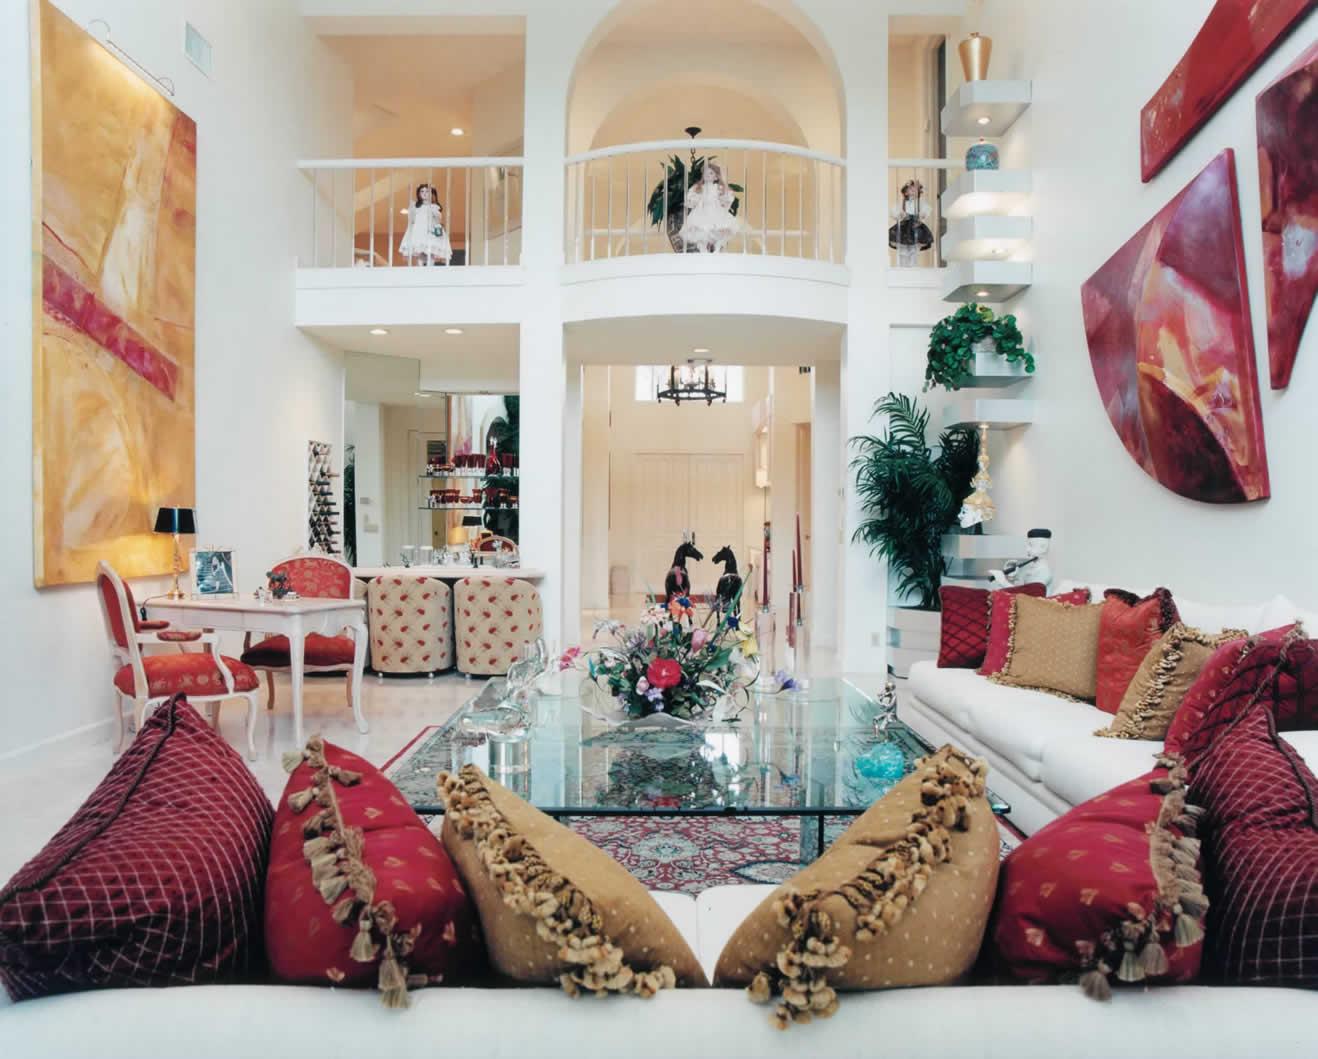 eclectic style residence boca raton florida korn